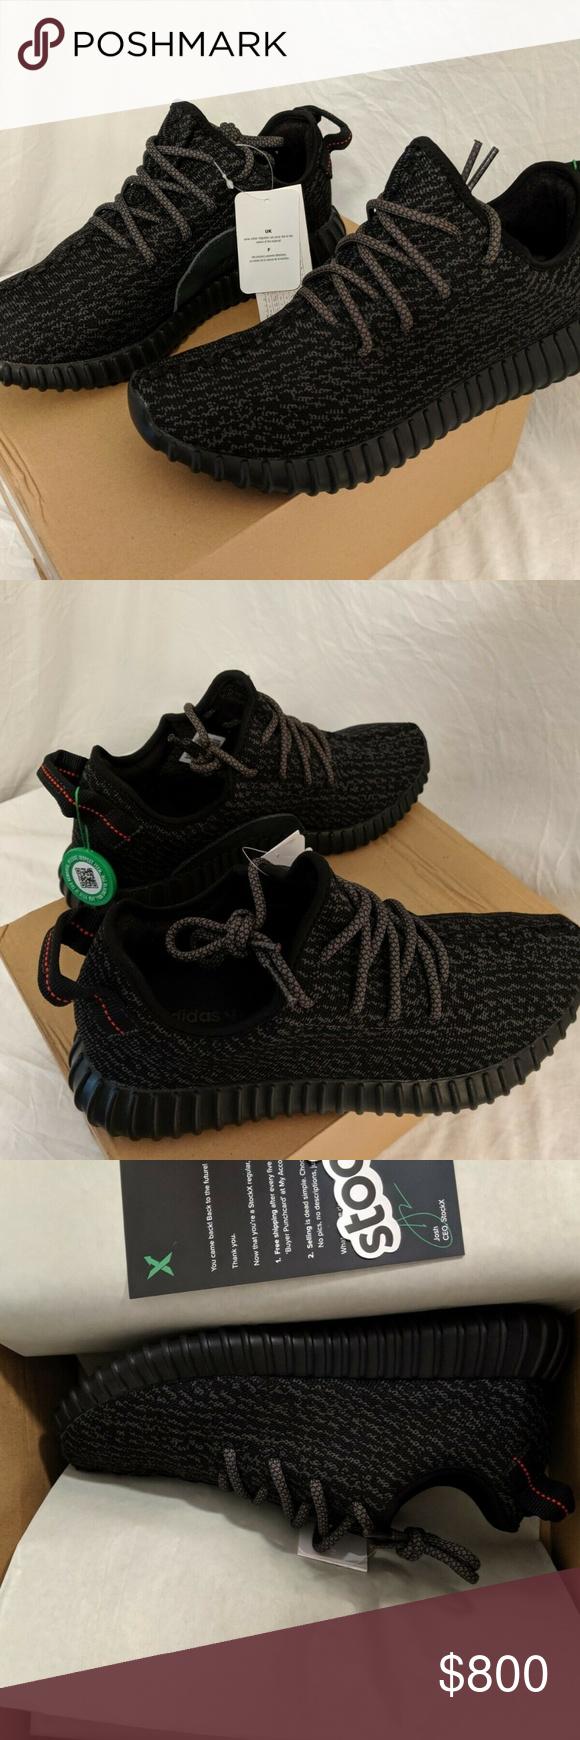 adidas yeezy v1 pirate black